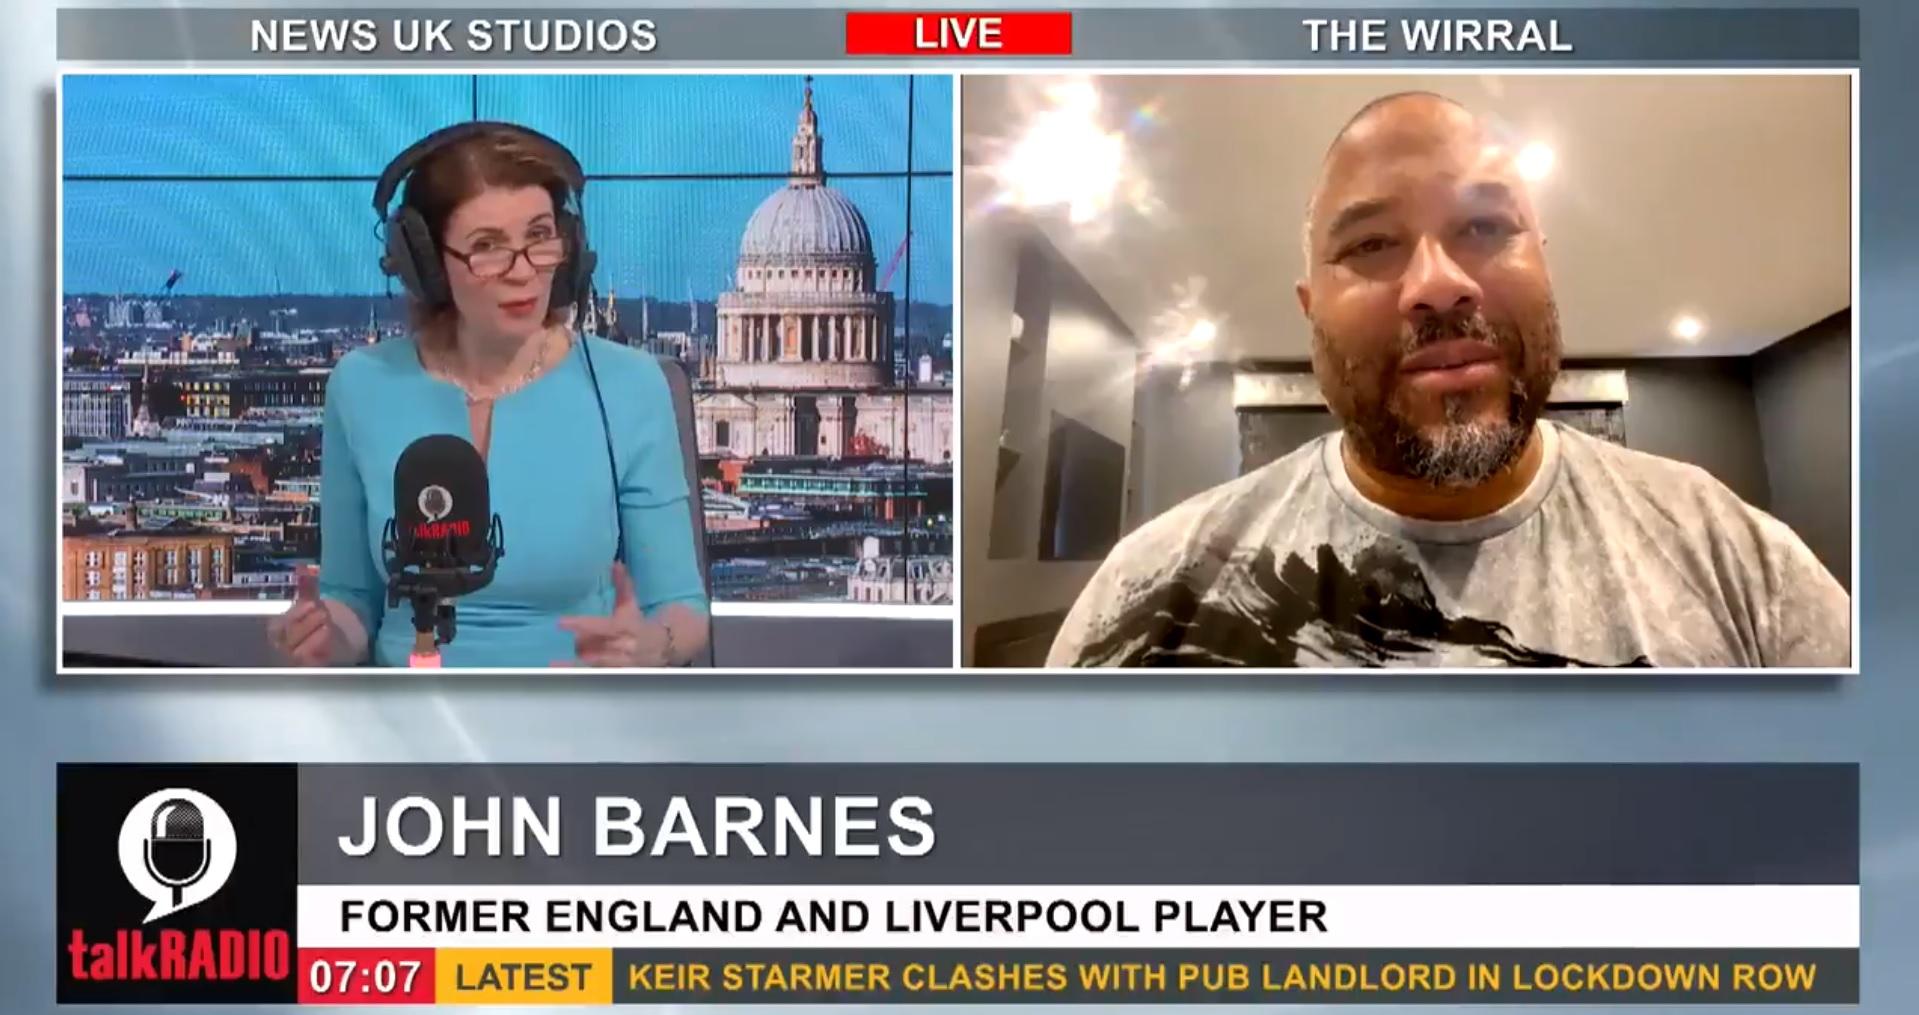 'You can't have it both ways' – Replacing FSG wouldn't make any sense, says John Barnes